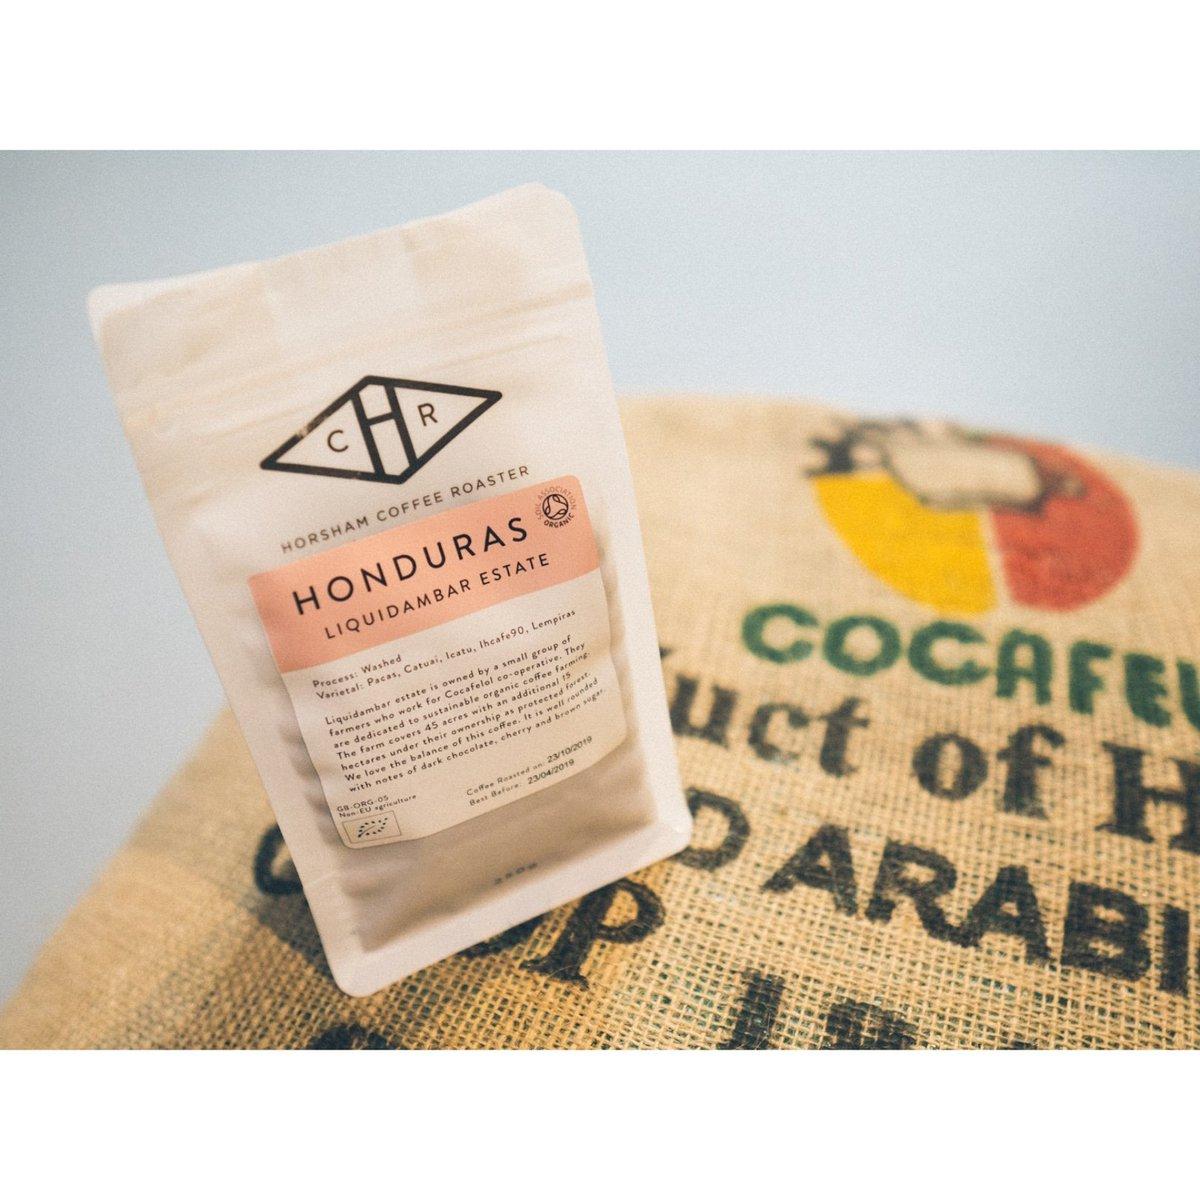 Horsham Coffee Roast At Horshamcoffee Twitter